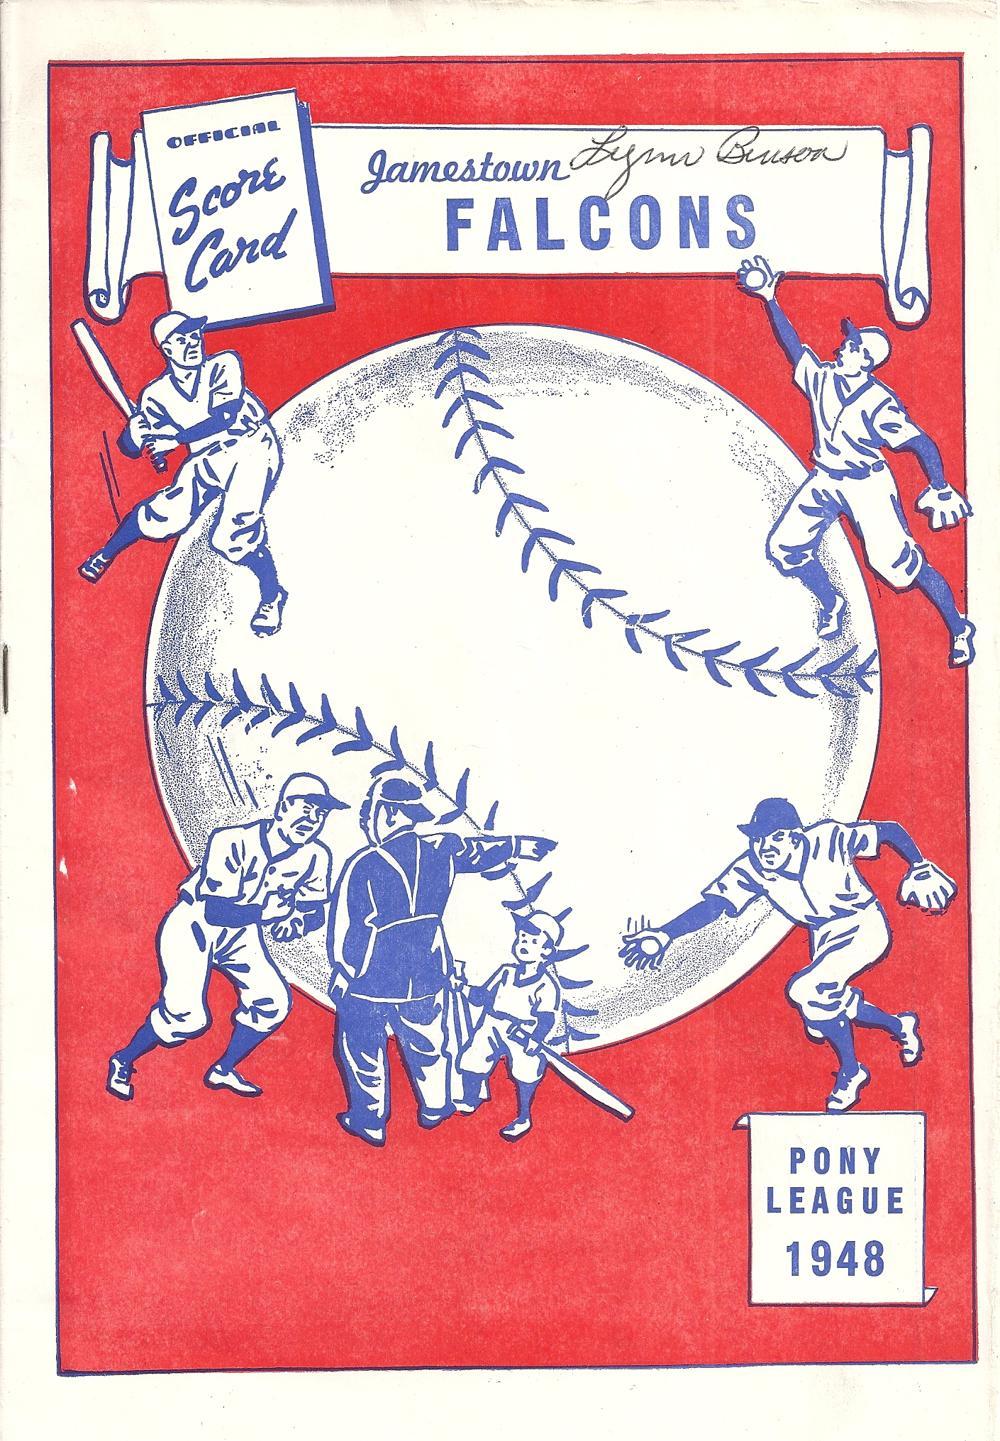 Jamestown Falcons 1948 Program